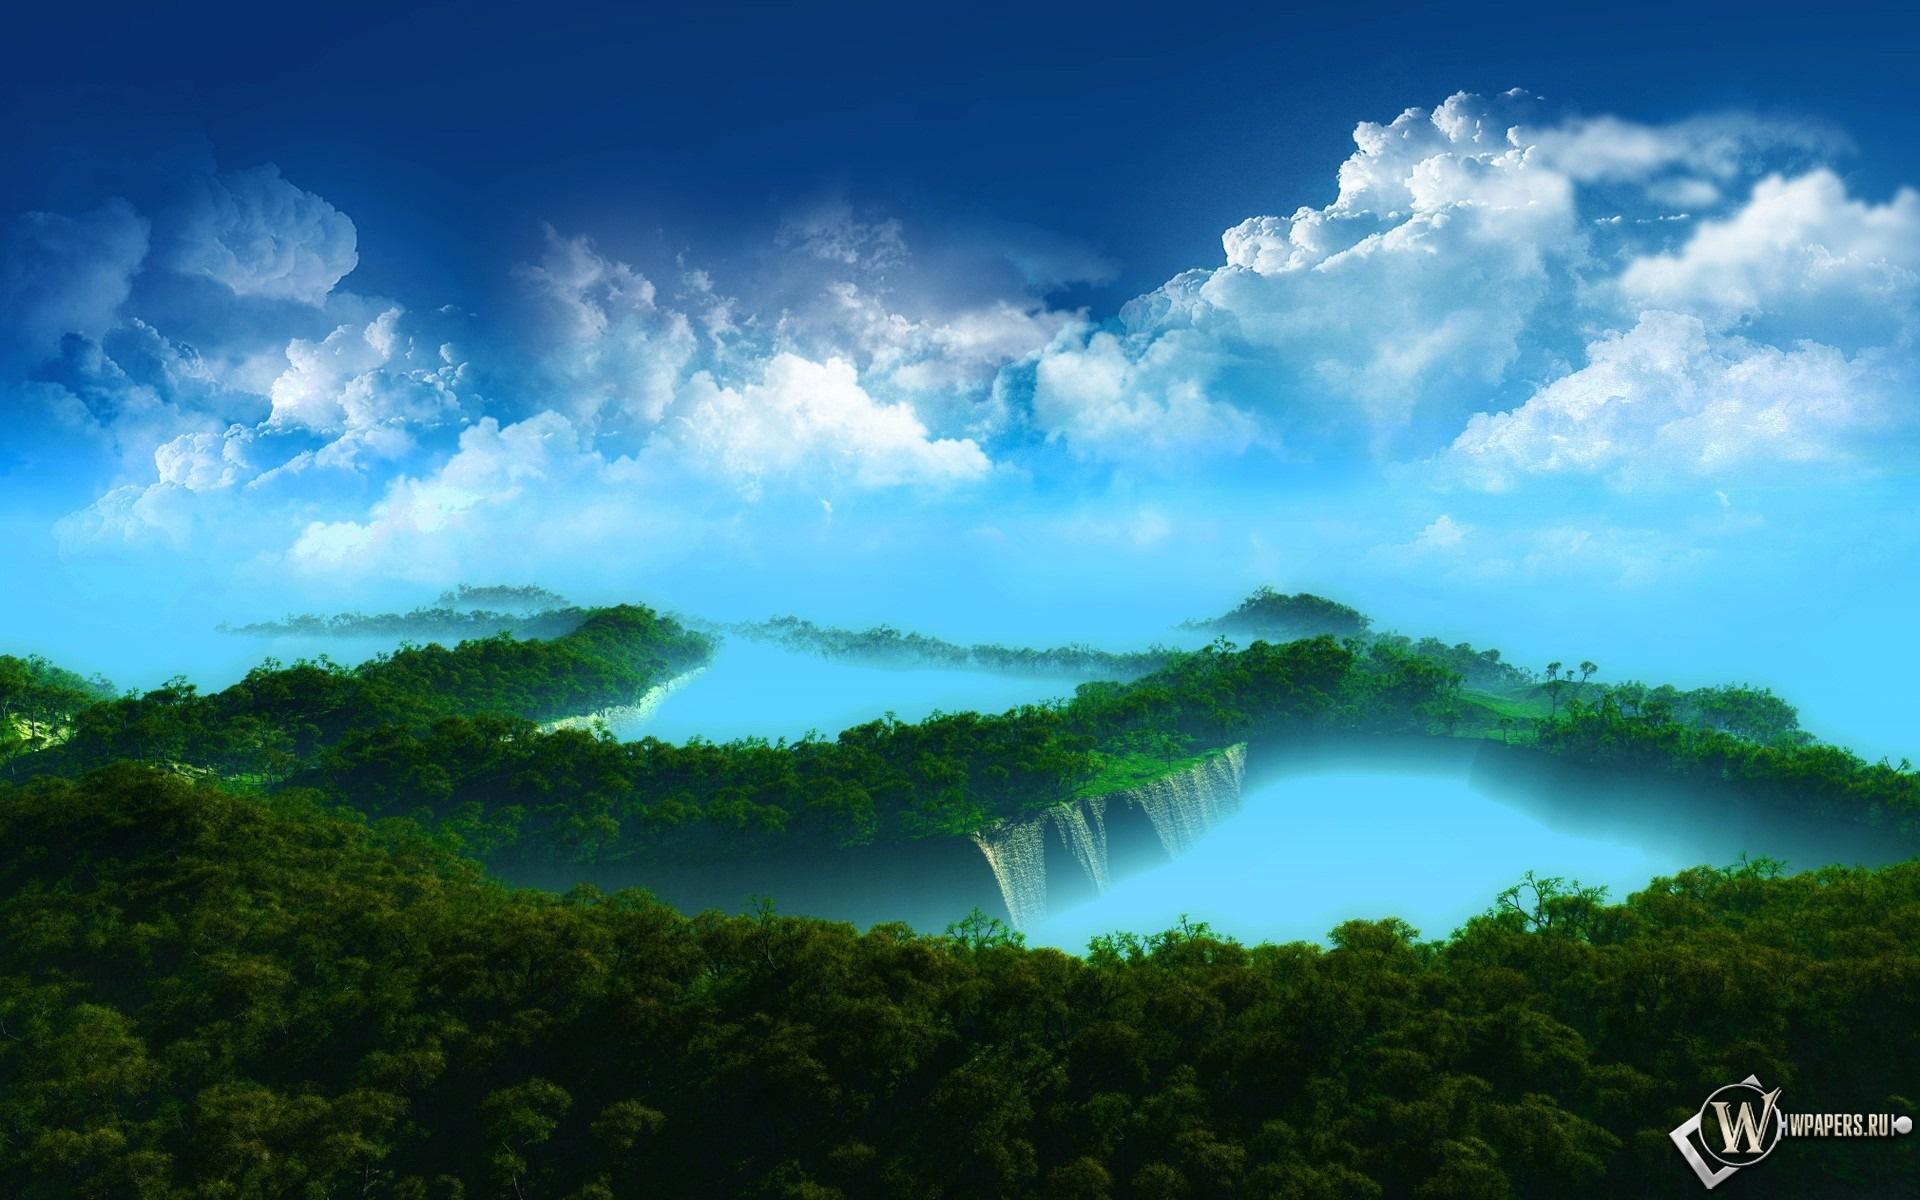 Острова в облаках 1920x1200